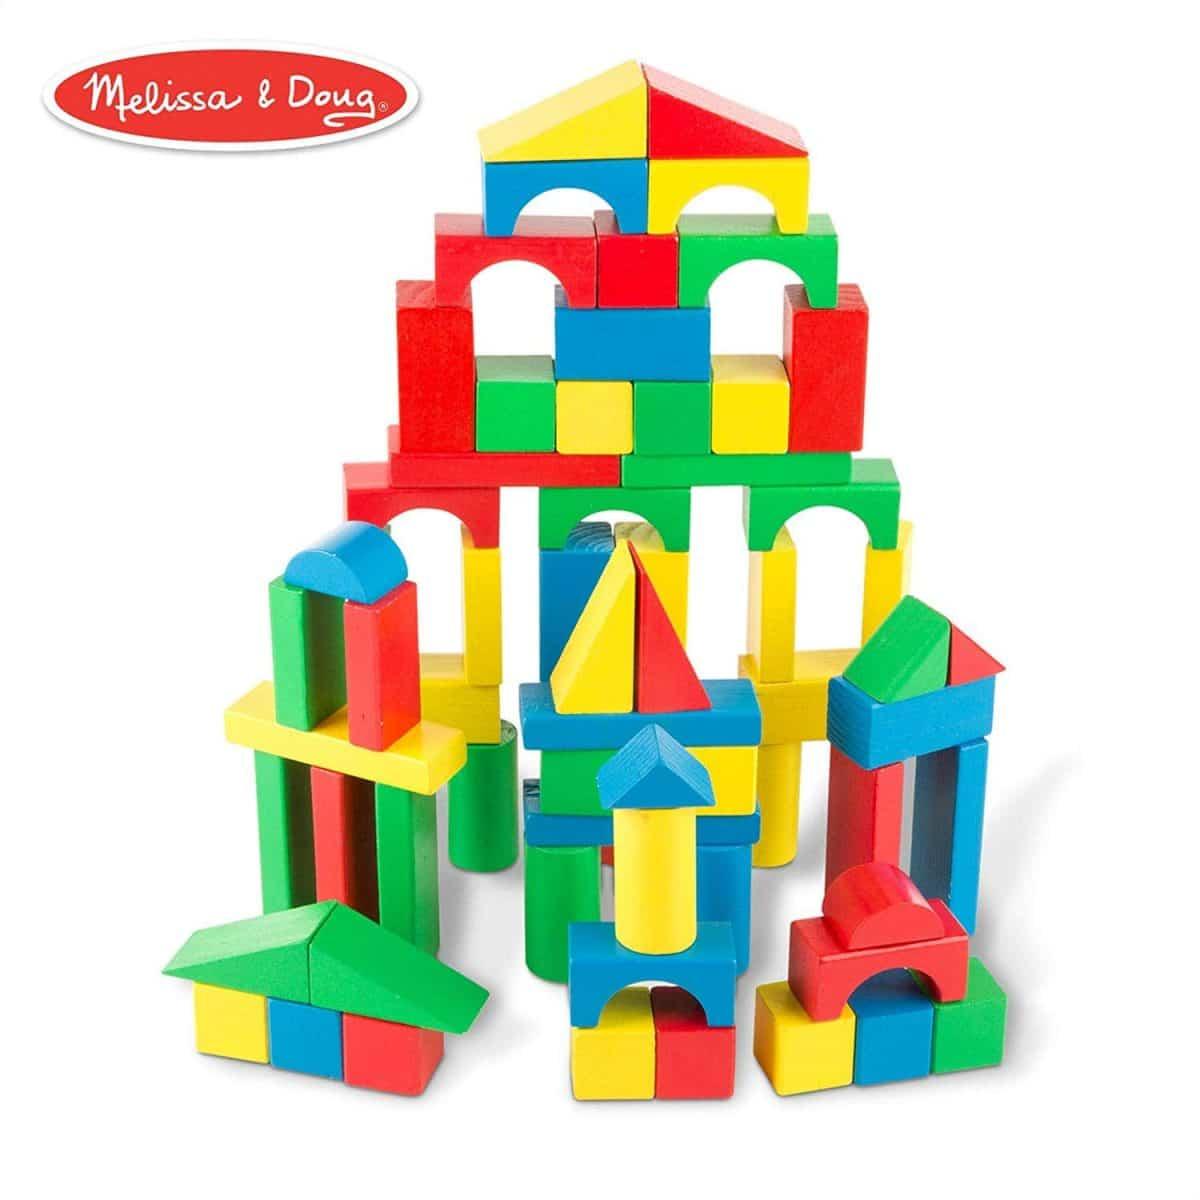 Fun Building Blocks Minifigure Brick Toys for Parent Children Game